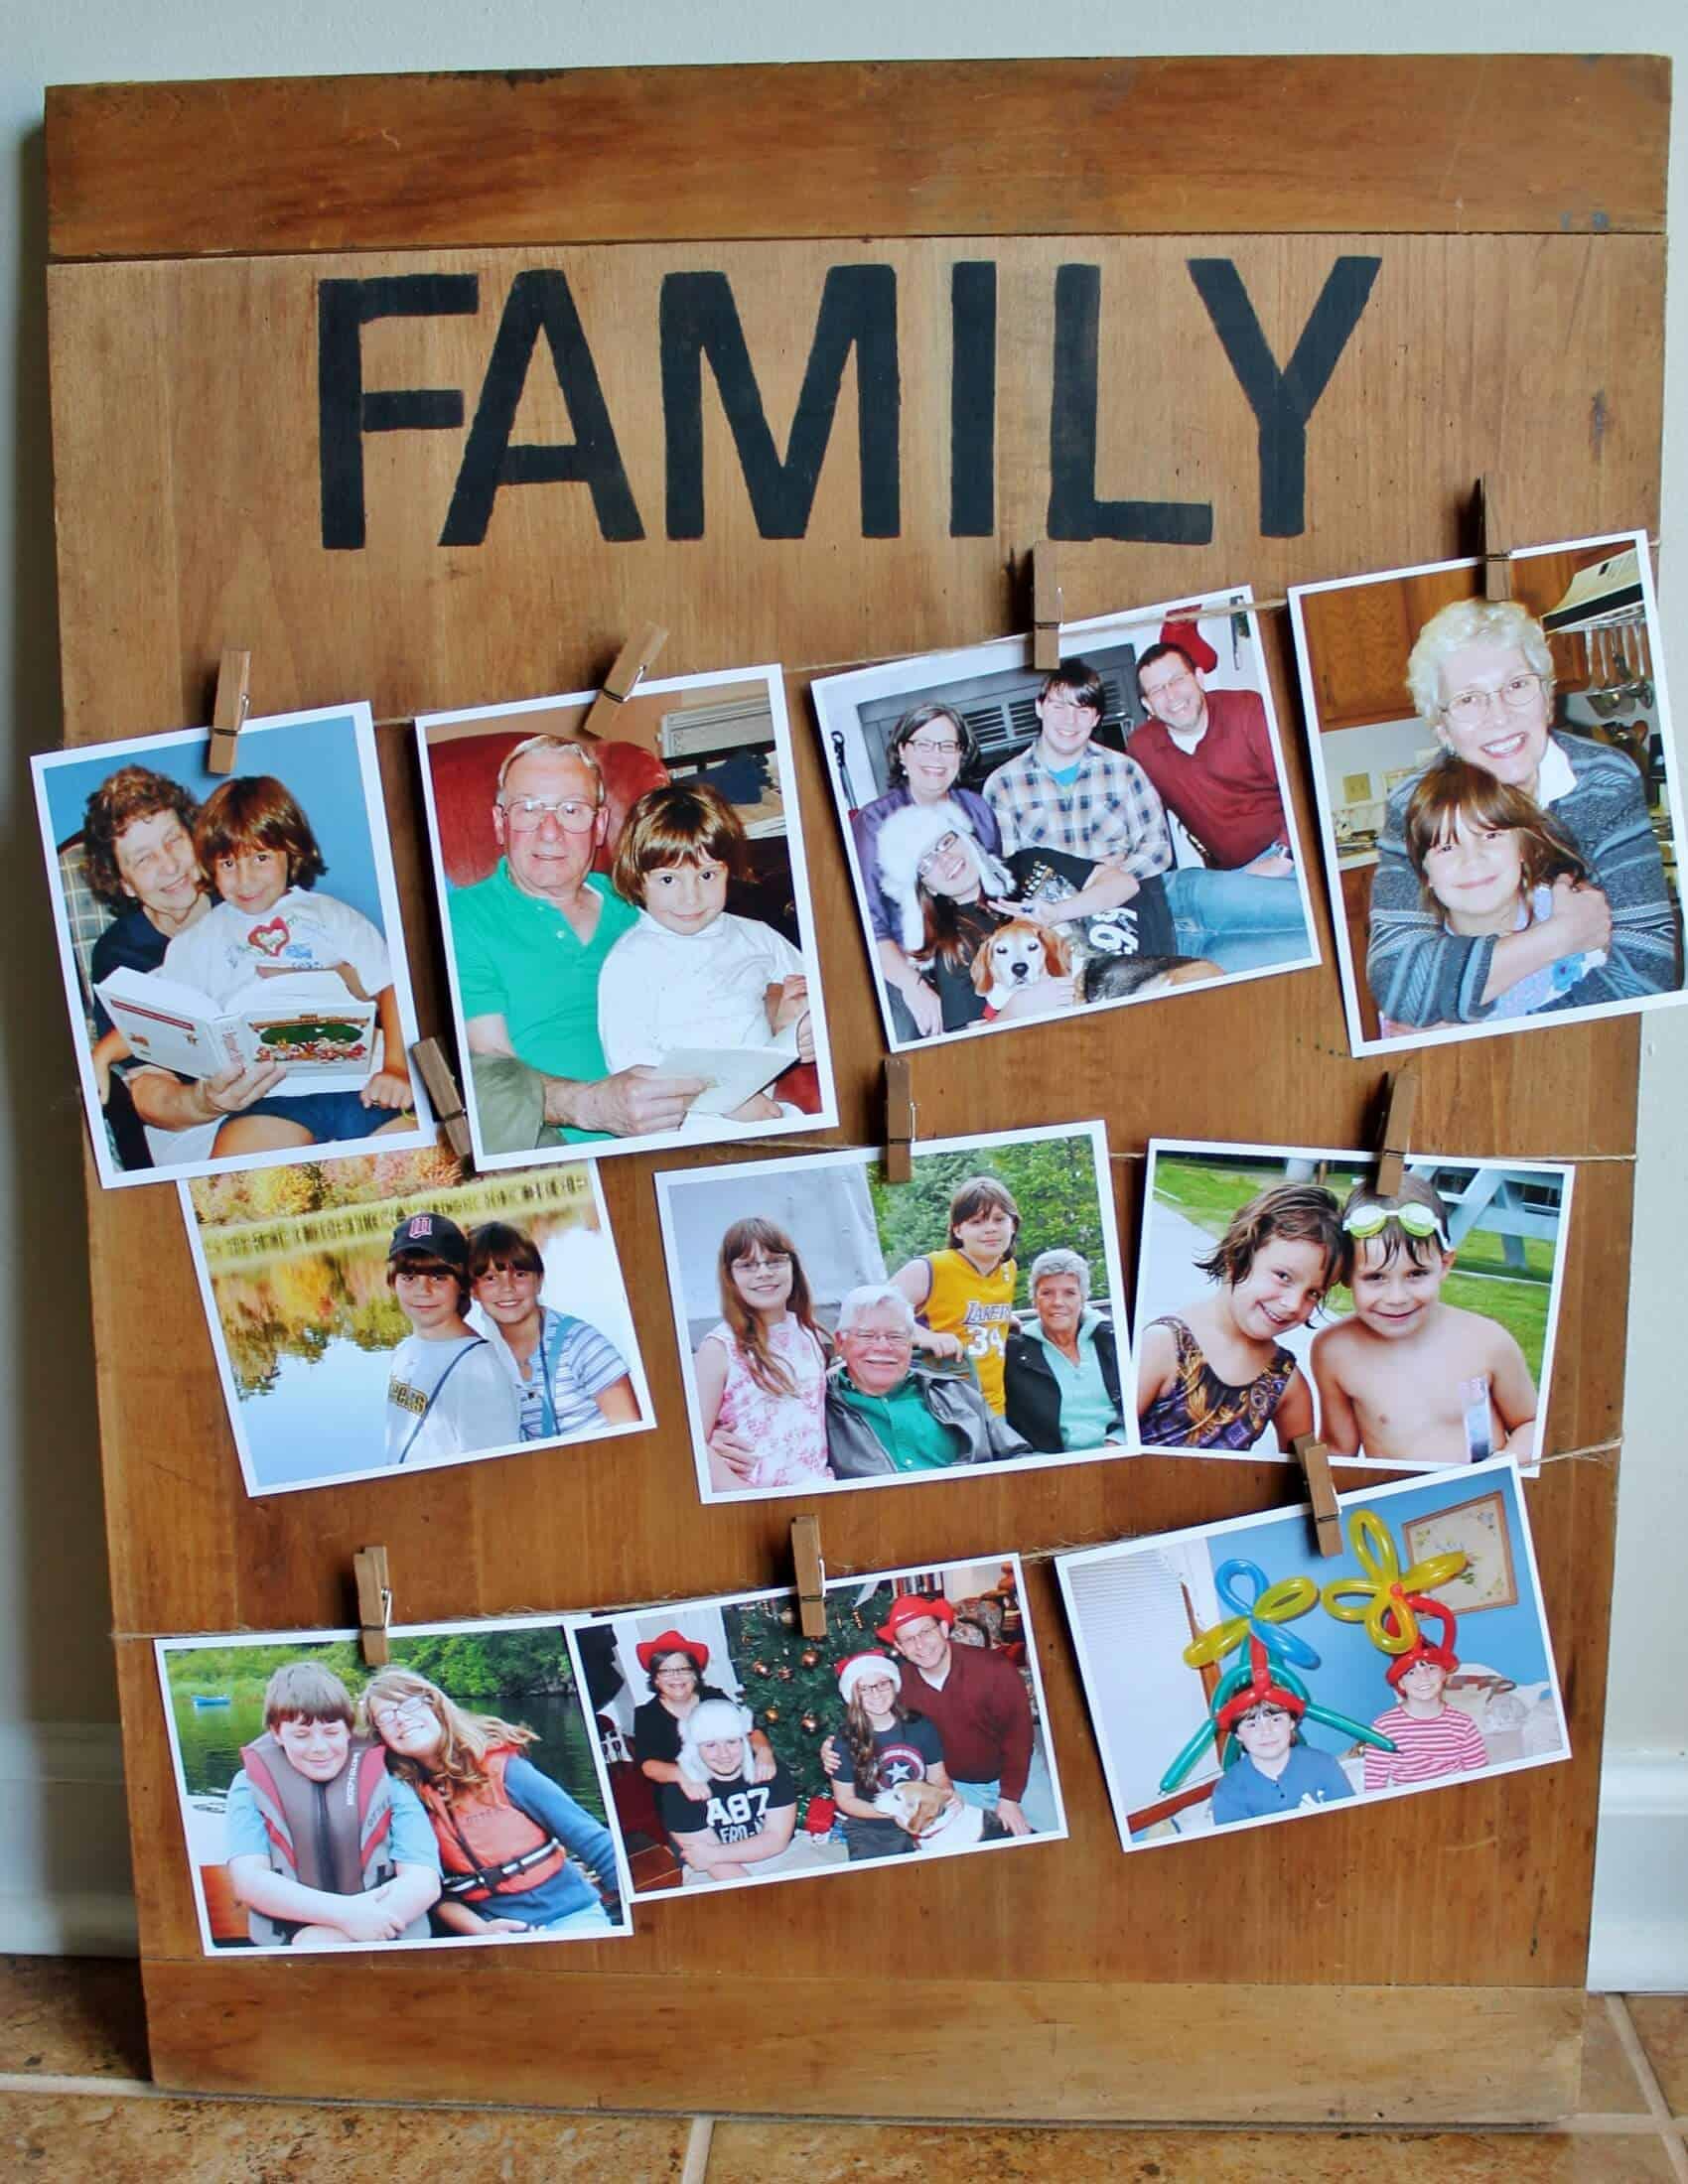 Family bread board with family photos